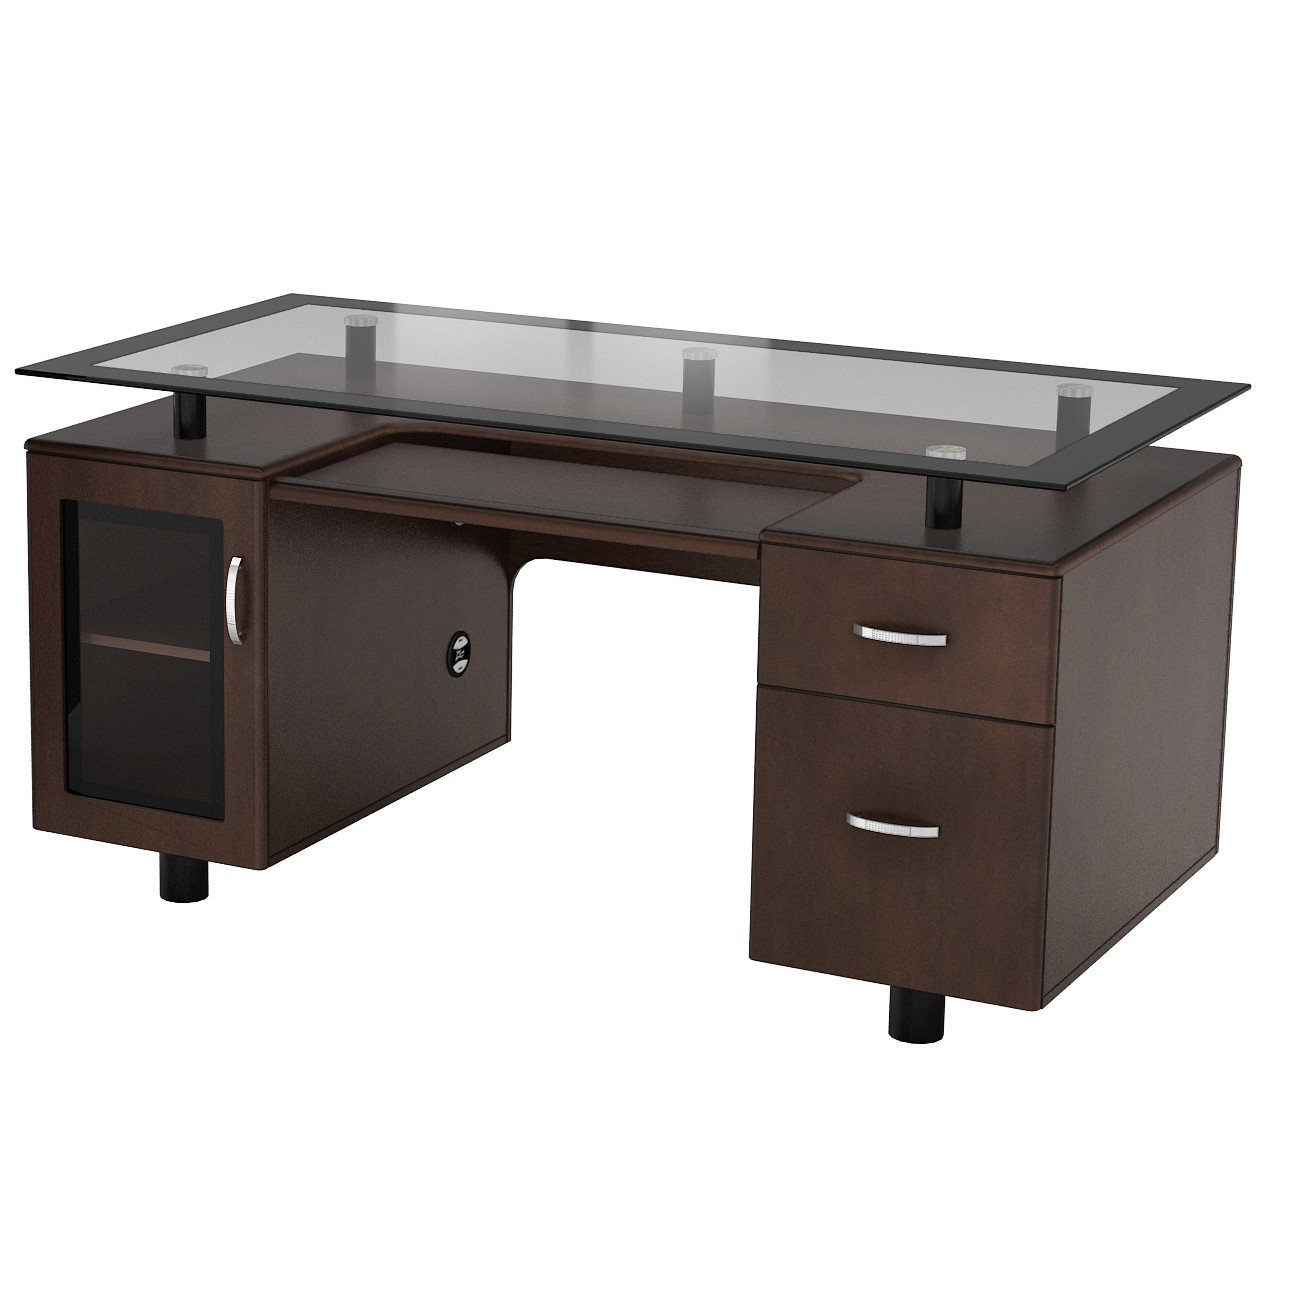 Amazon com zen modern executive desk home office desk home kitchen